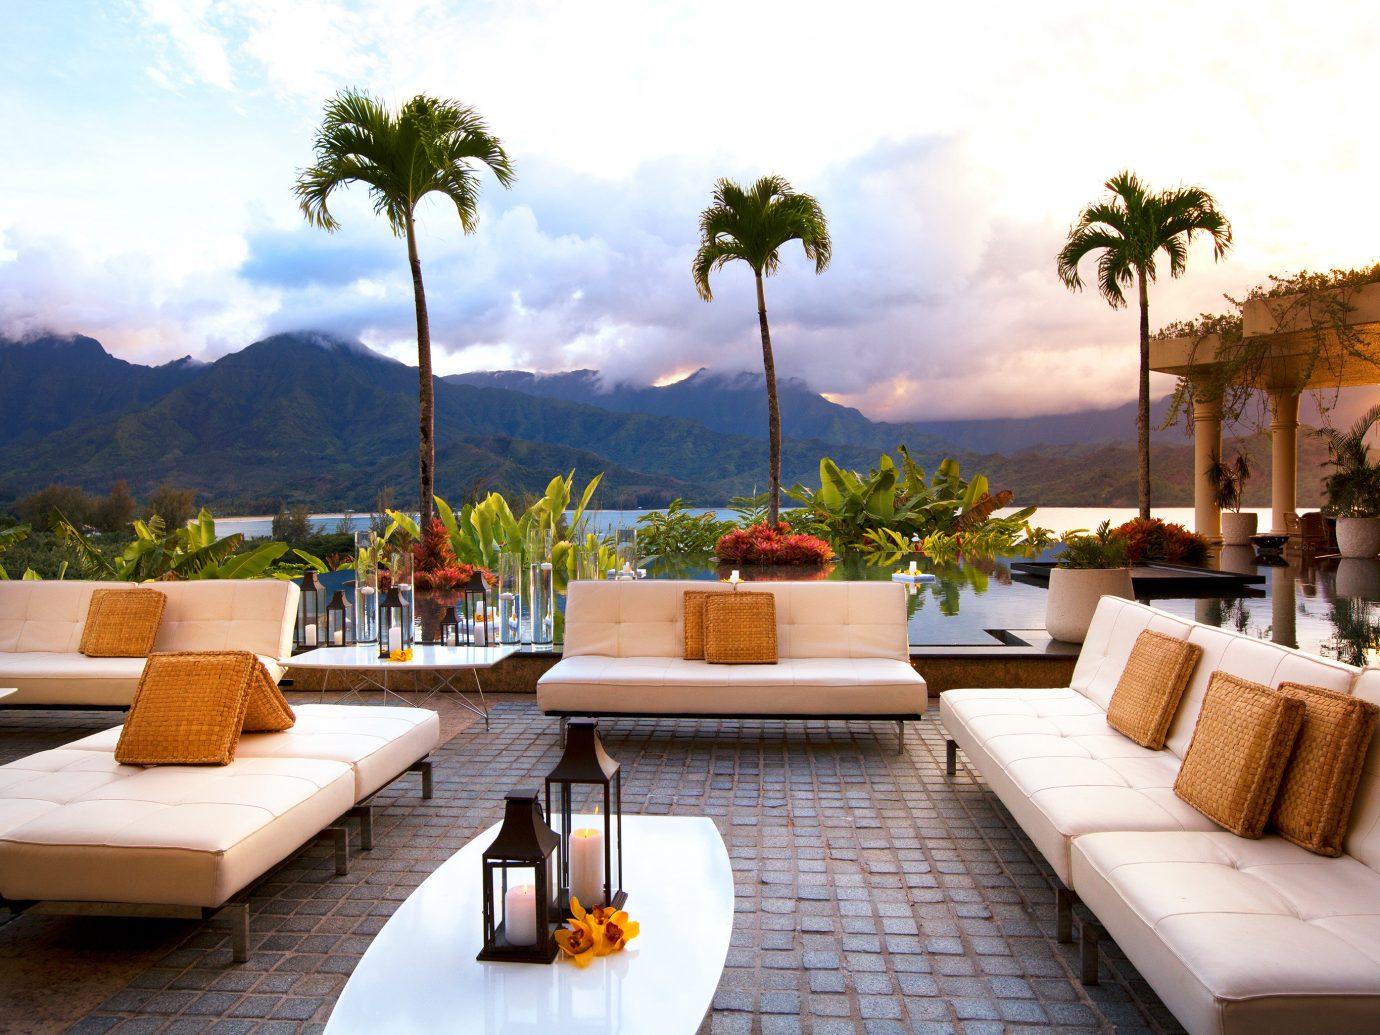 Beach Hotels Living Lounge Luxury Scenic views Trip Ideas sky outdoor property Resort estate vacation Villa home condominium real estate interior design hacienda restaurant furniture